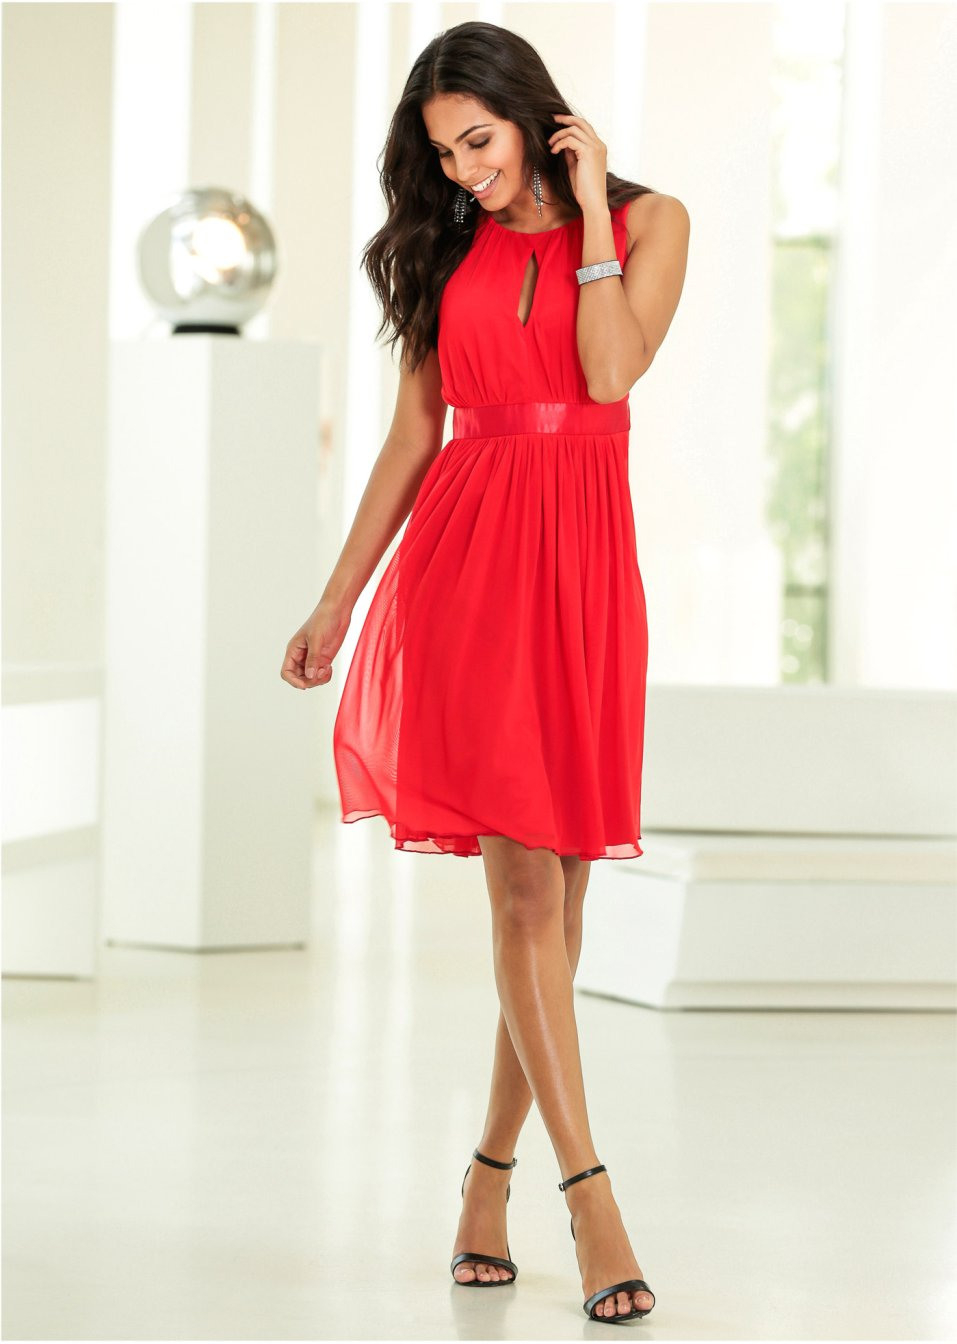 20 Spektakulär Rotes Abendkleid Kurz VertriebDesigner Cool Rotes Abendkleid Kurz Spezialgebiet